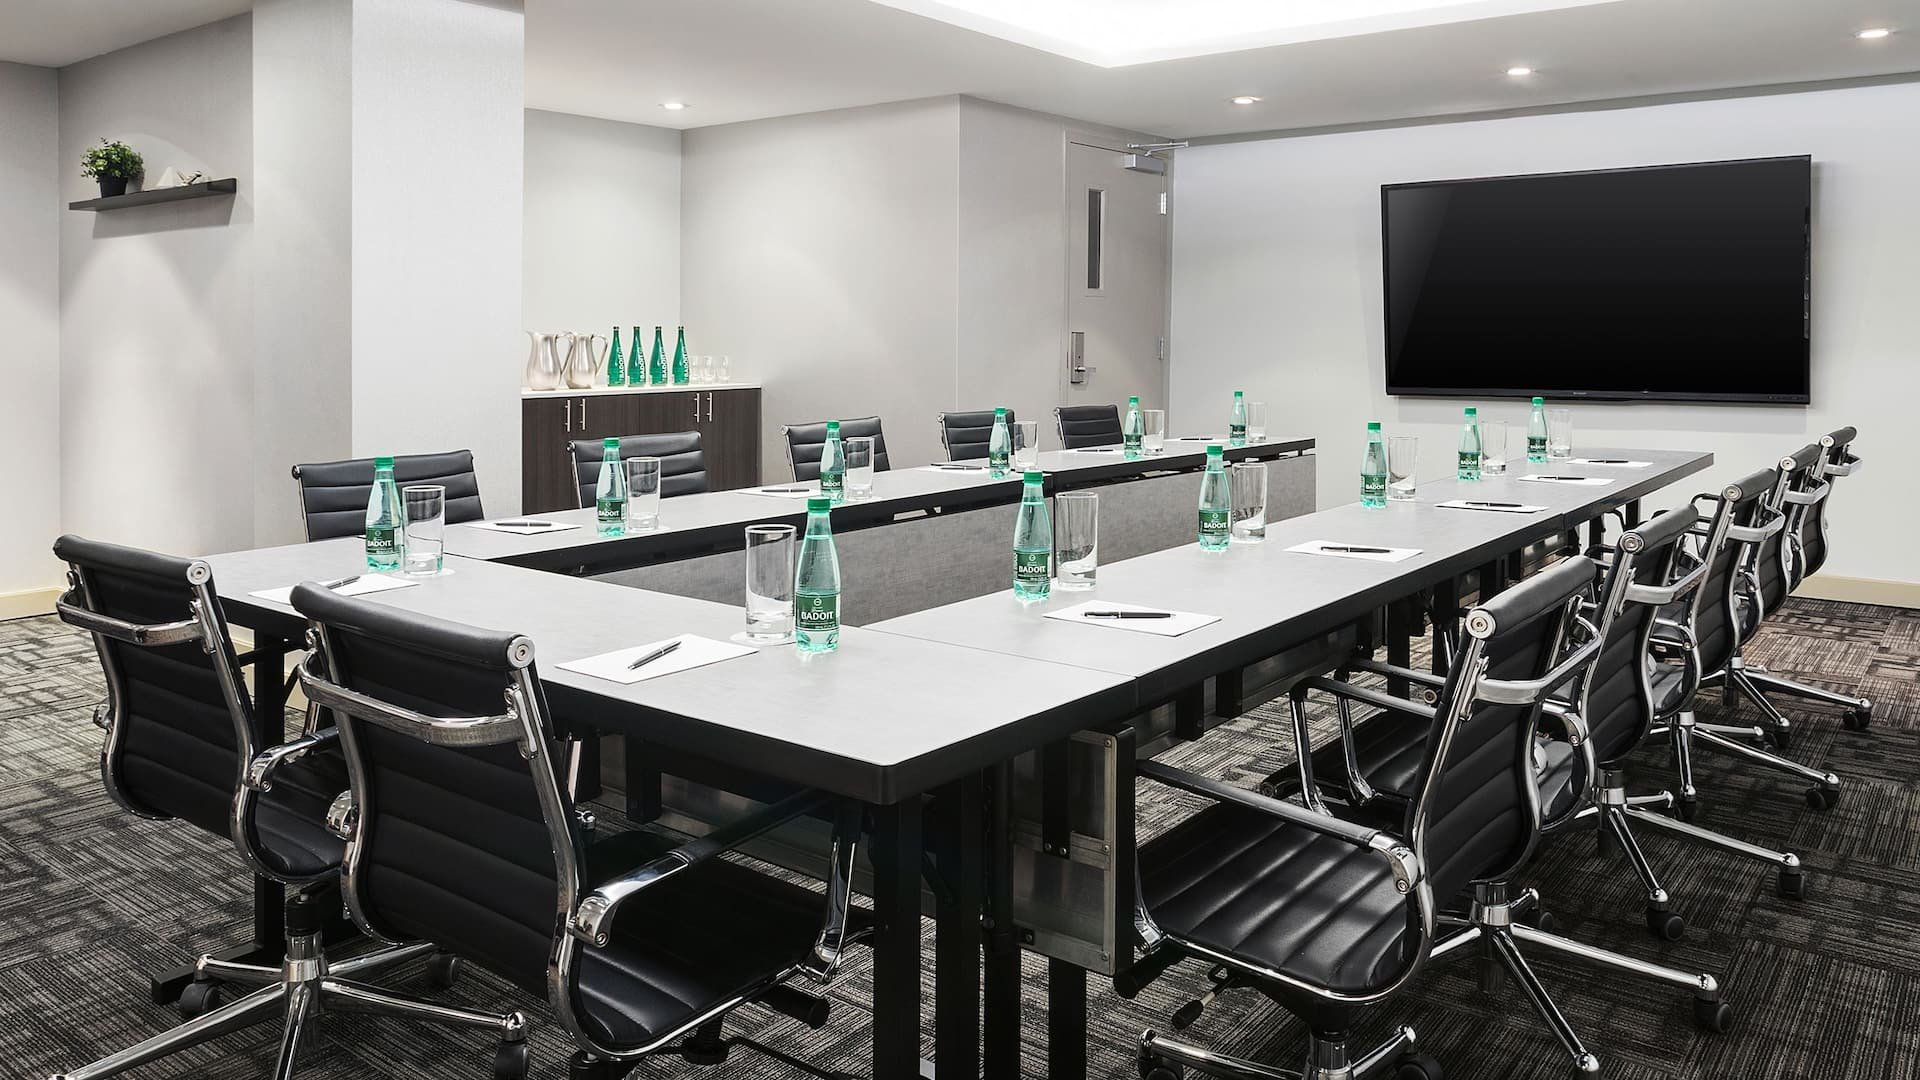 meeting room Ushape counter